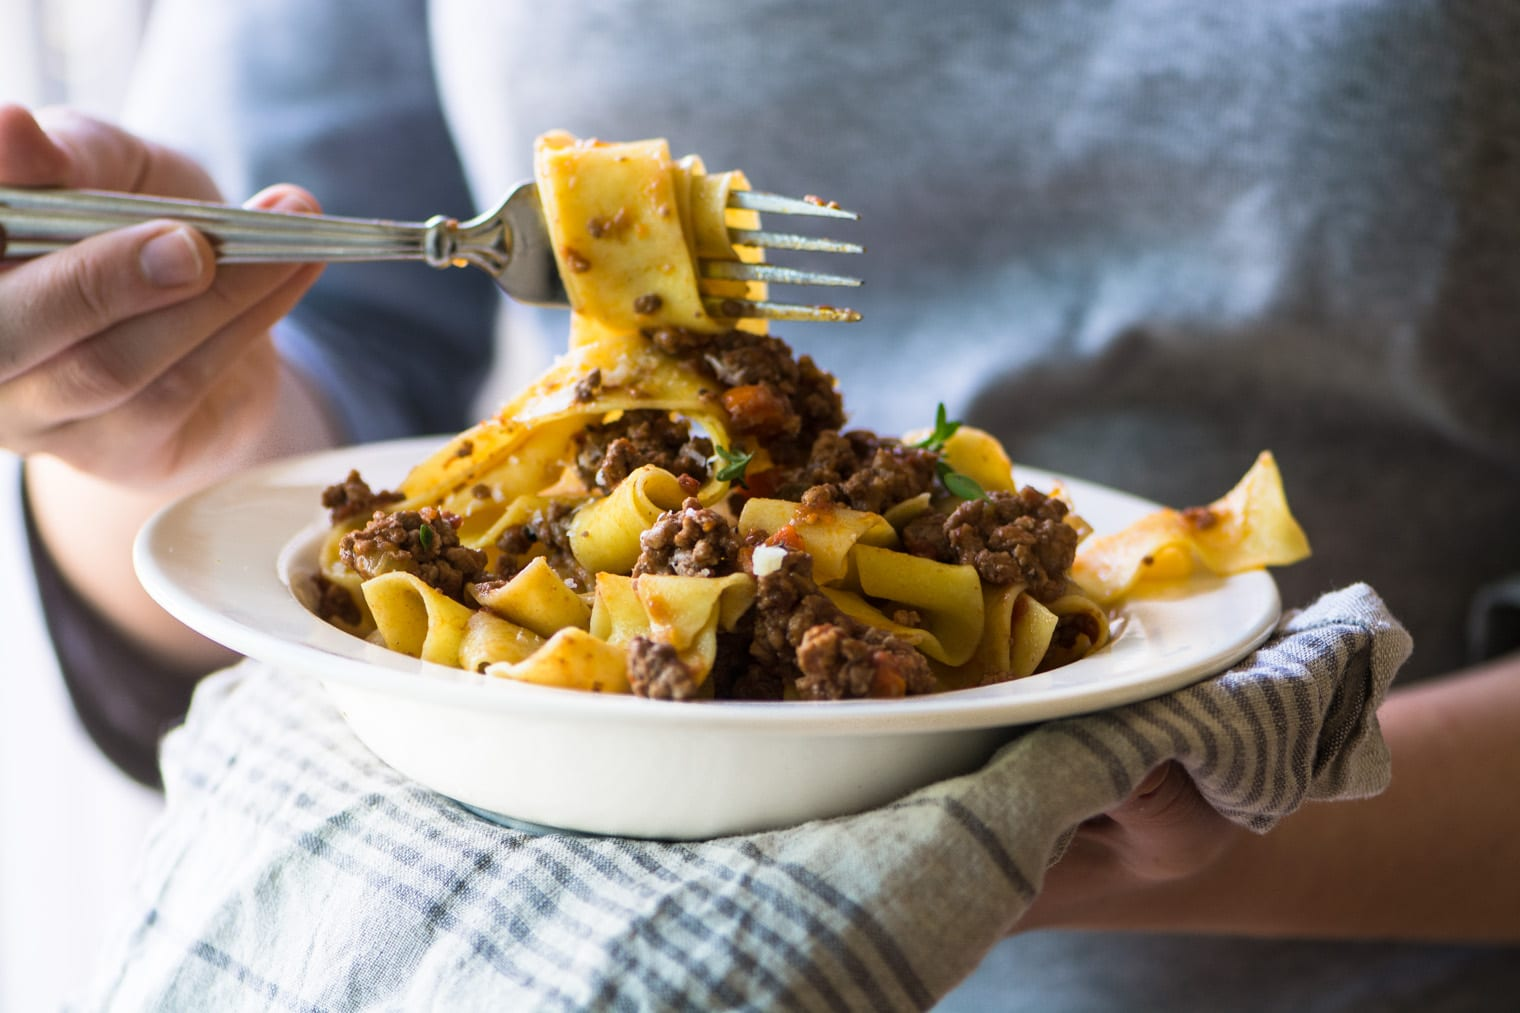 taking forkful of pasta Bolognese